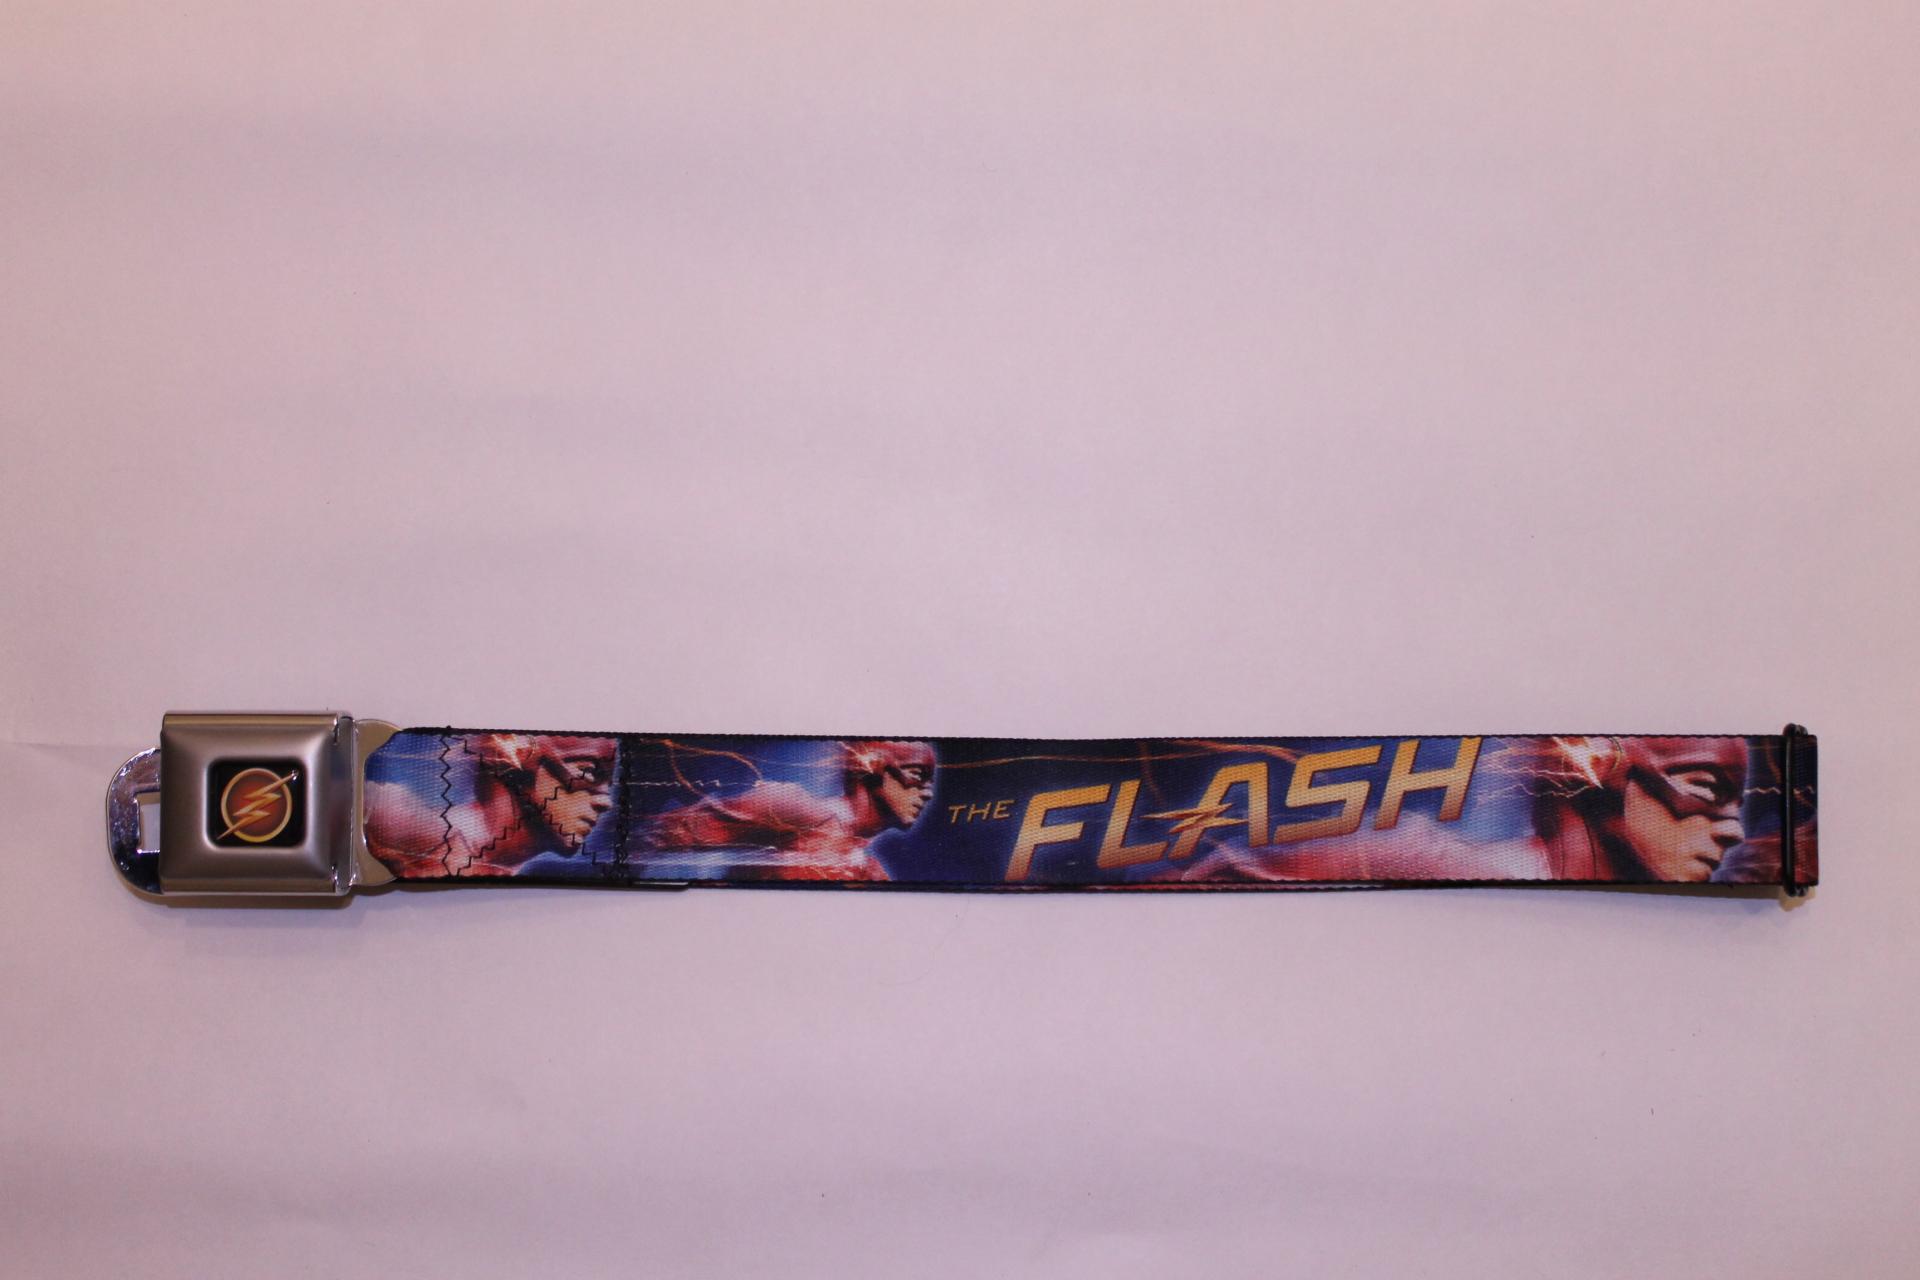 The Flash TV Show Seatbelt Belt